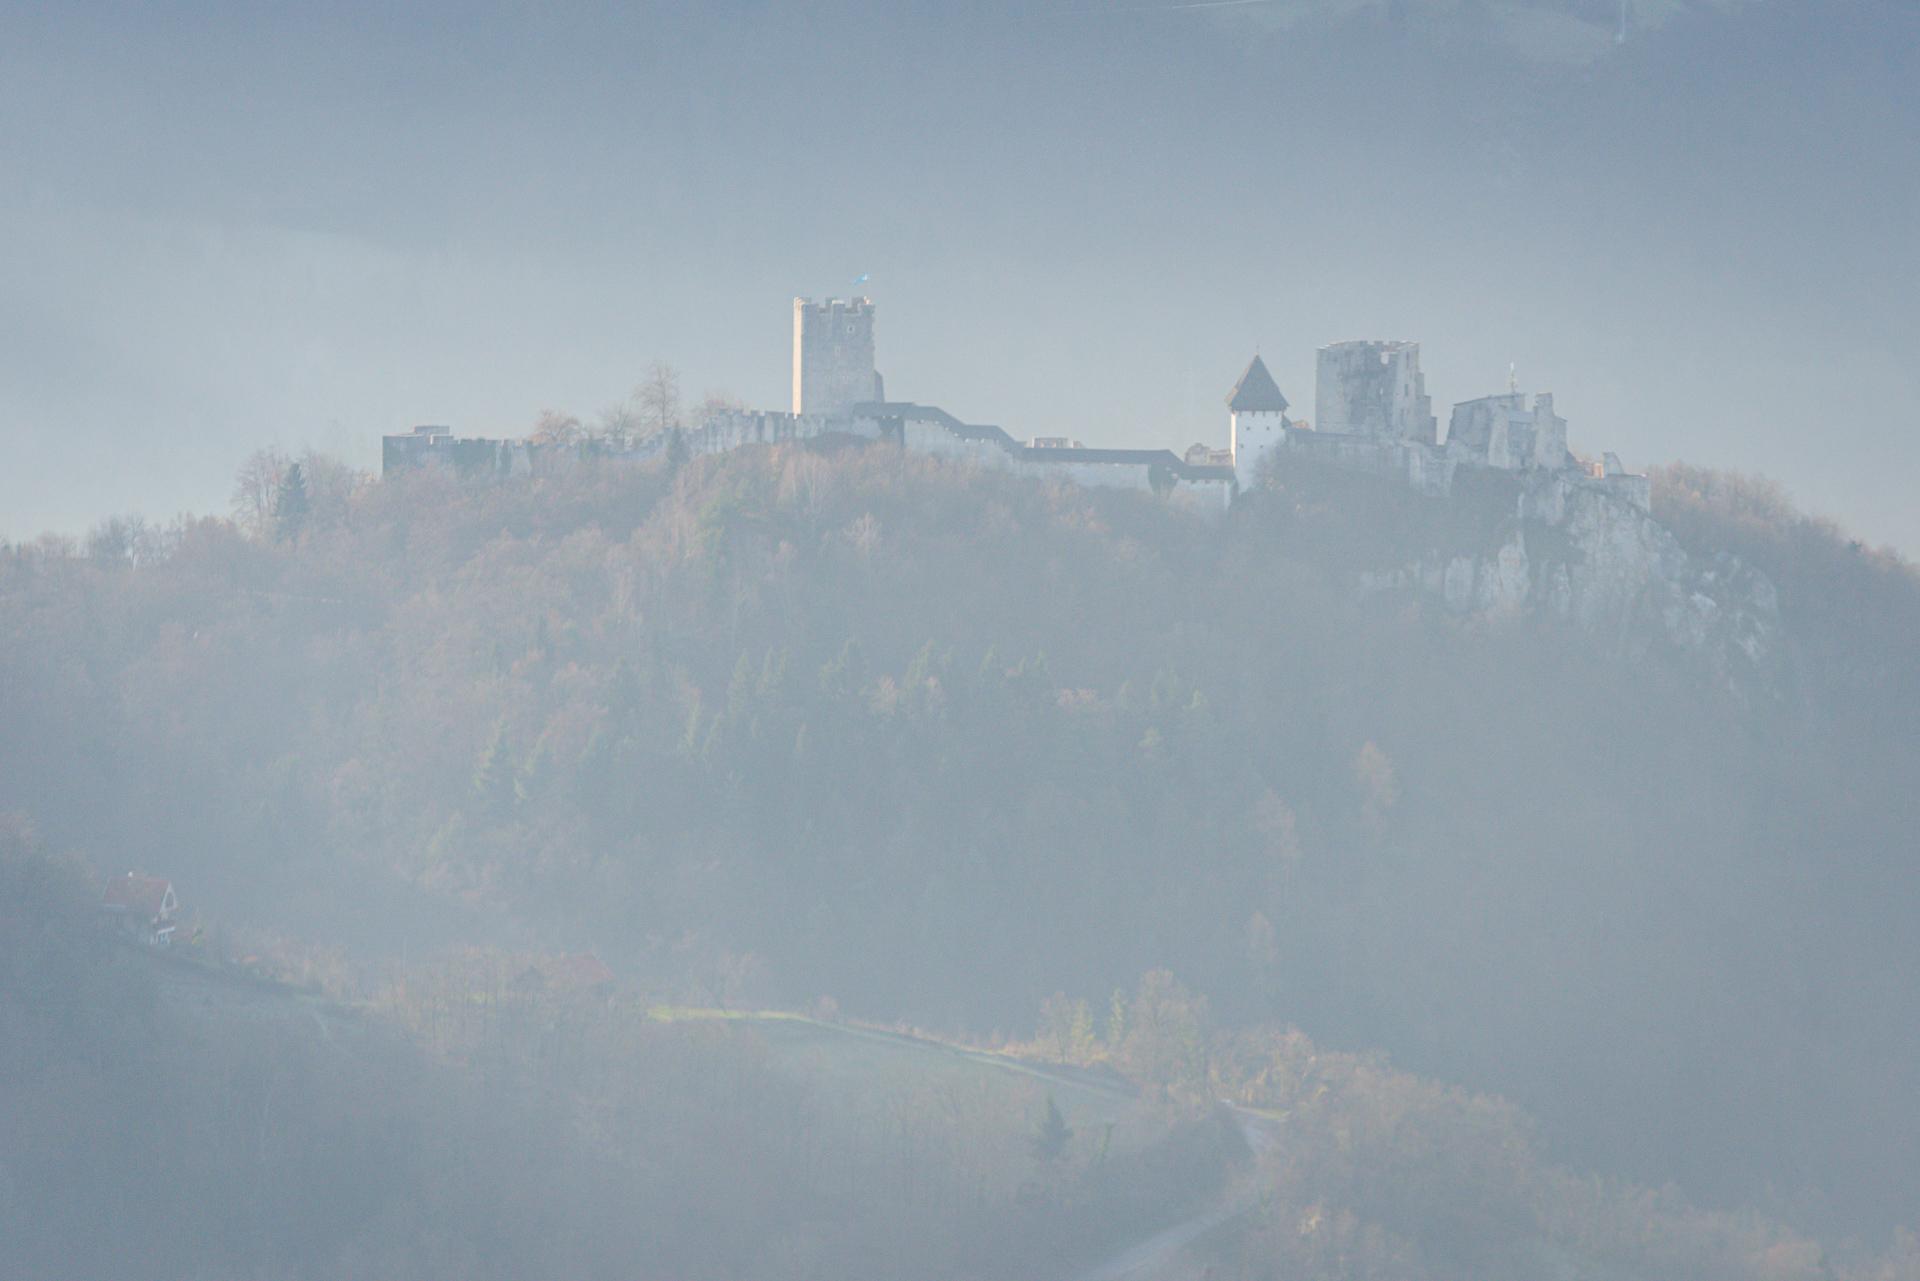 Zdene Podlesnik: Stari grad v megli